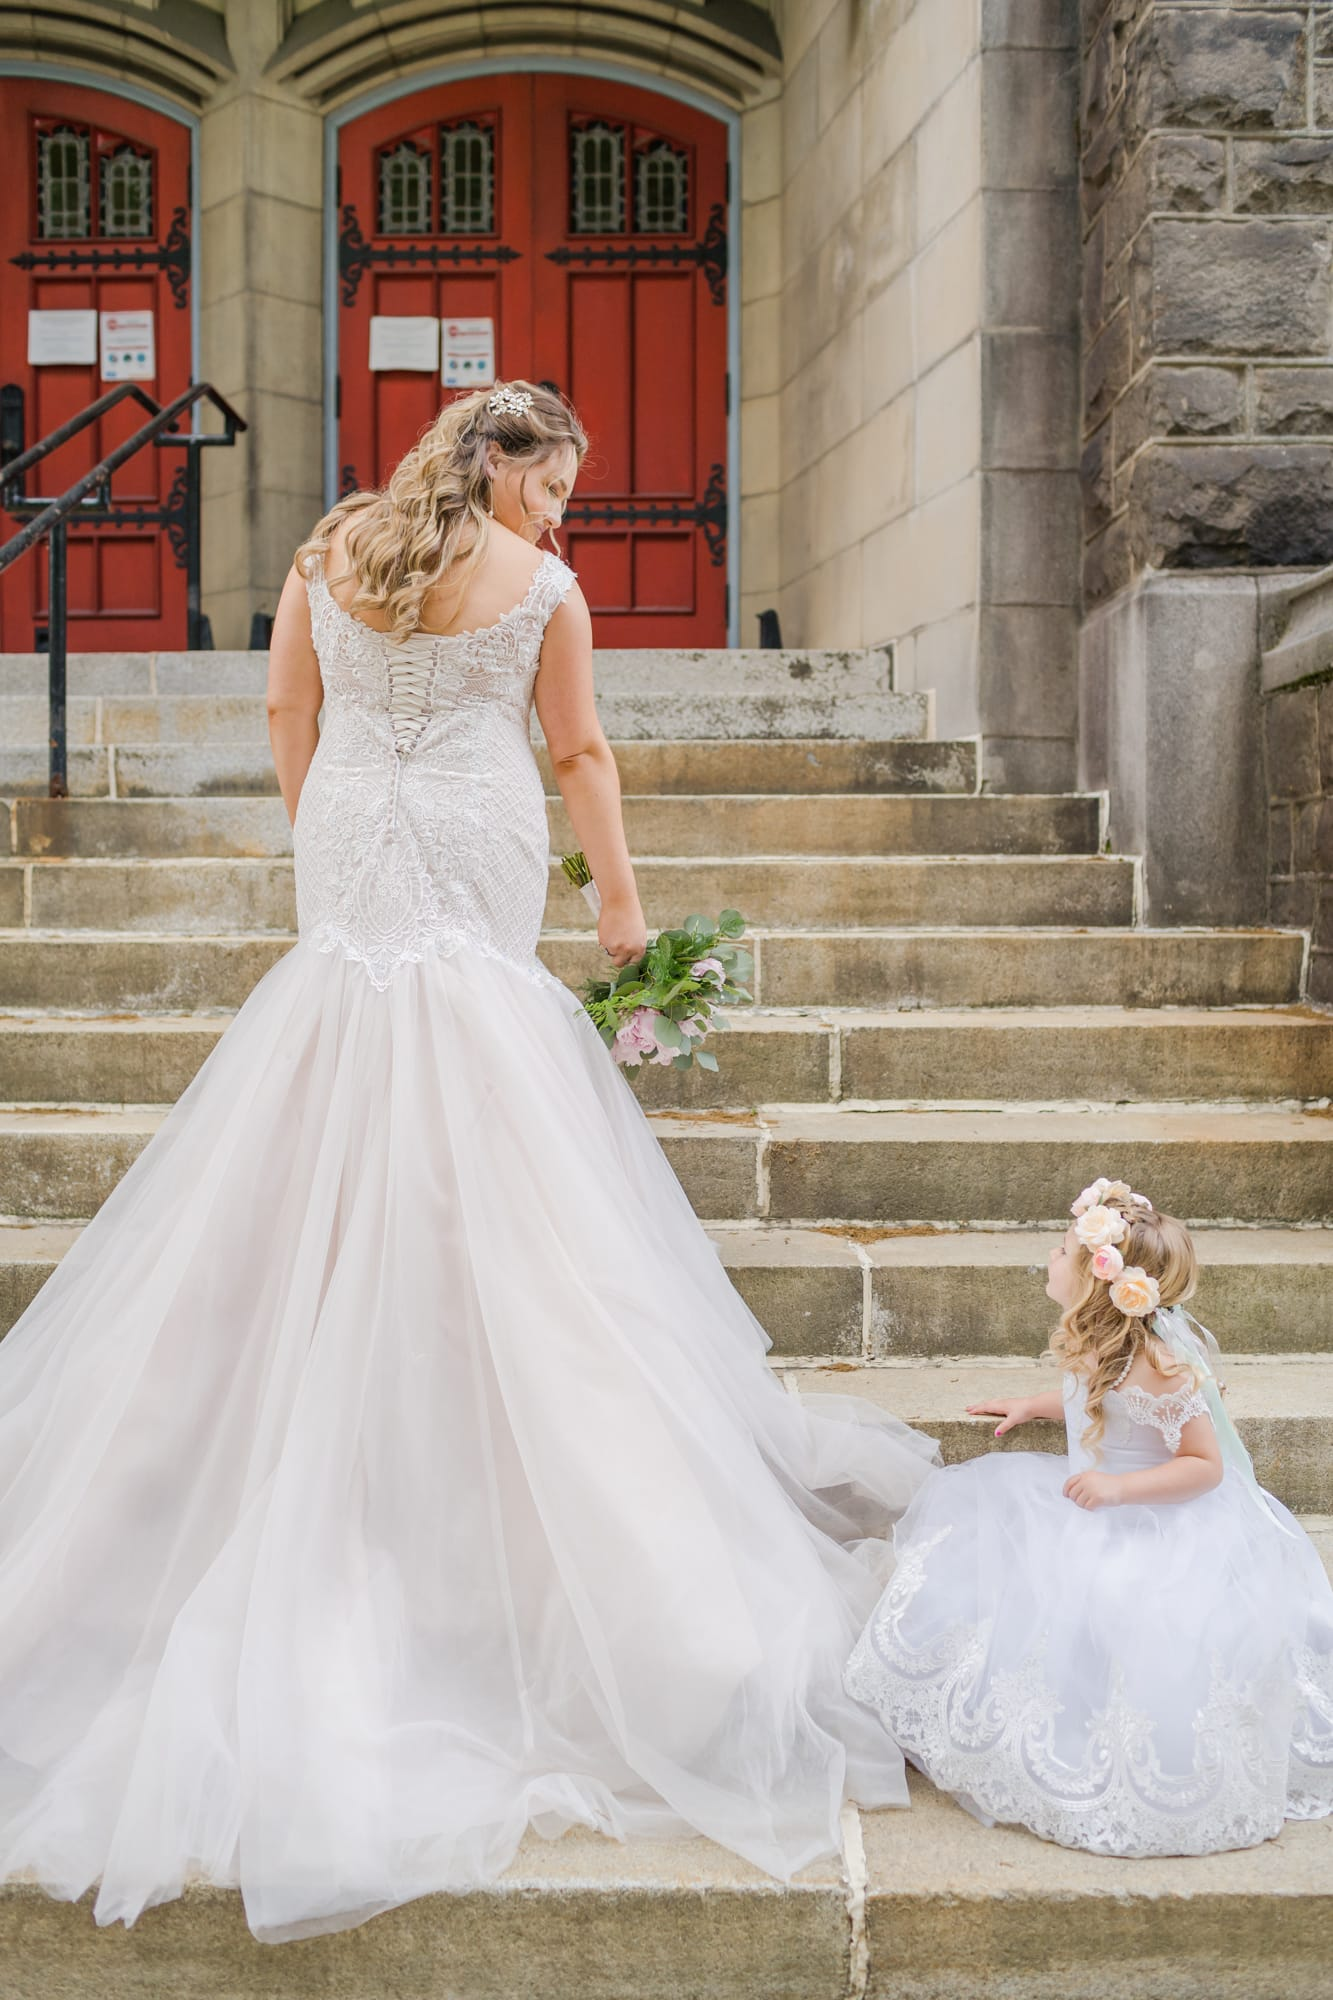 Central Pennsylvania PA summer wedding bride with flower girl